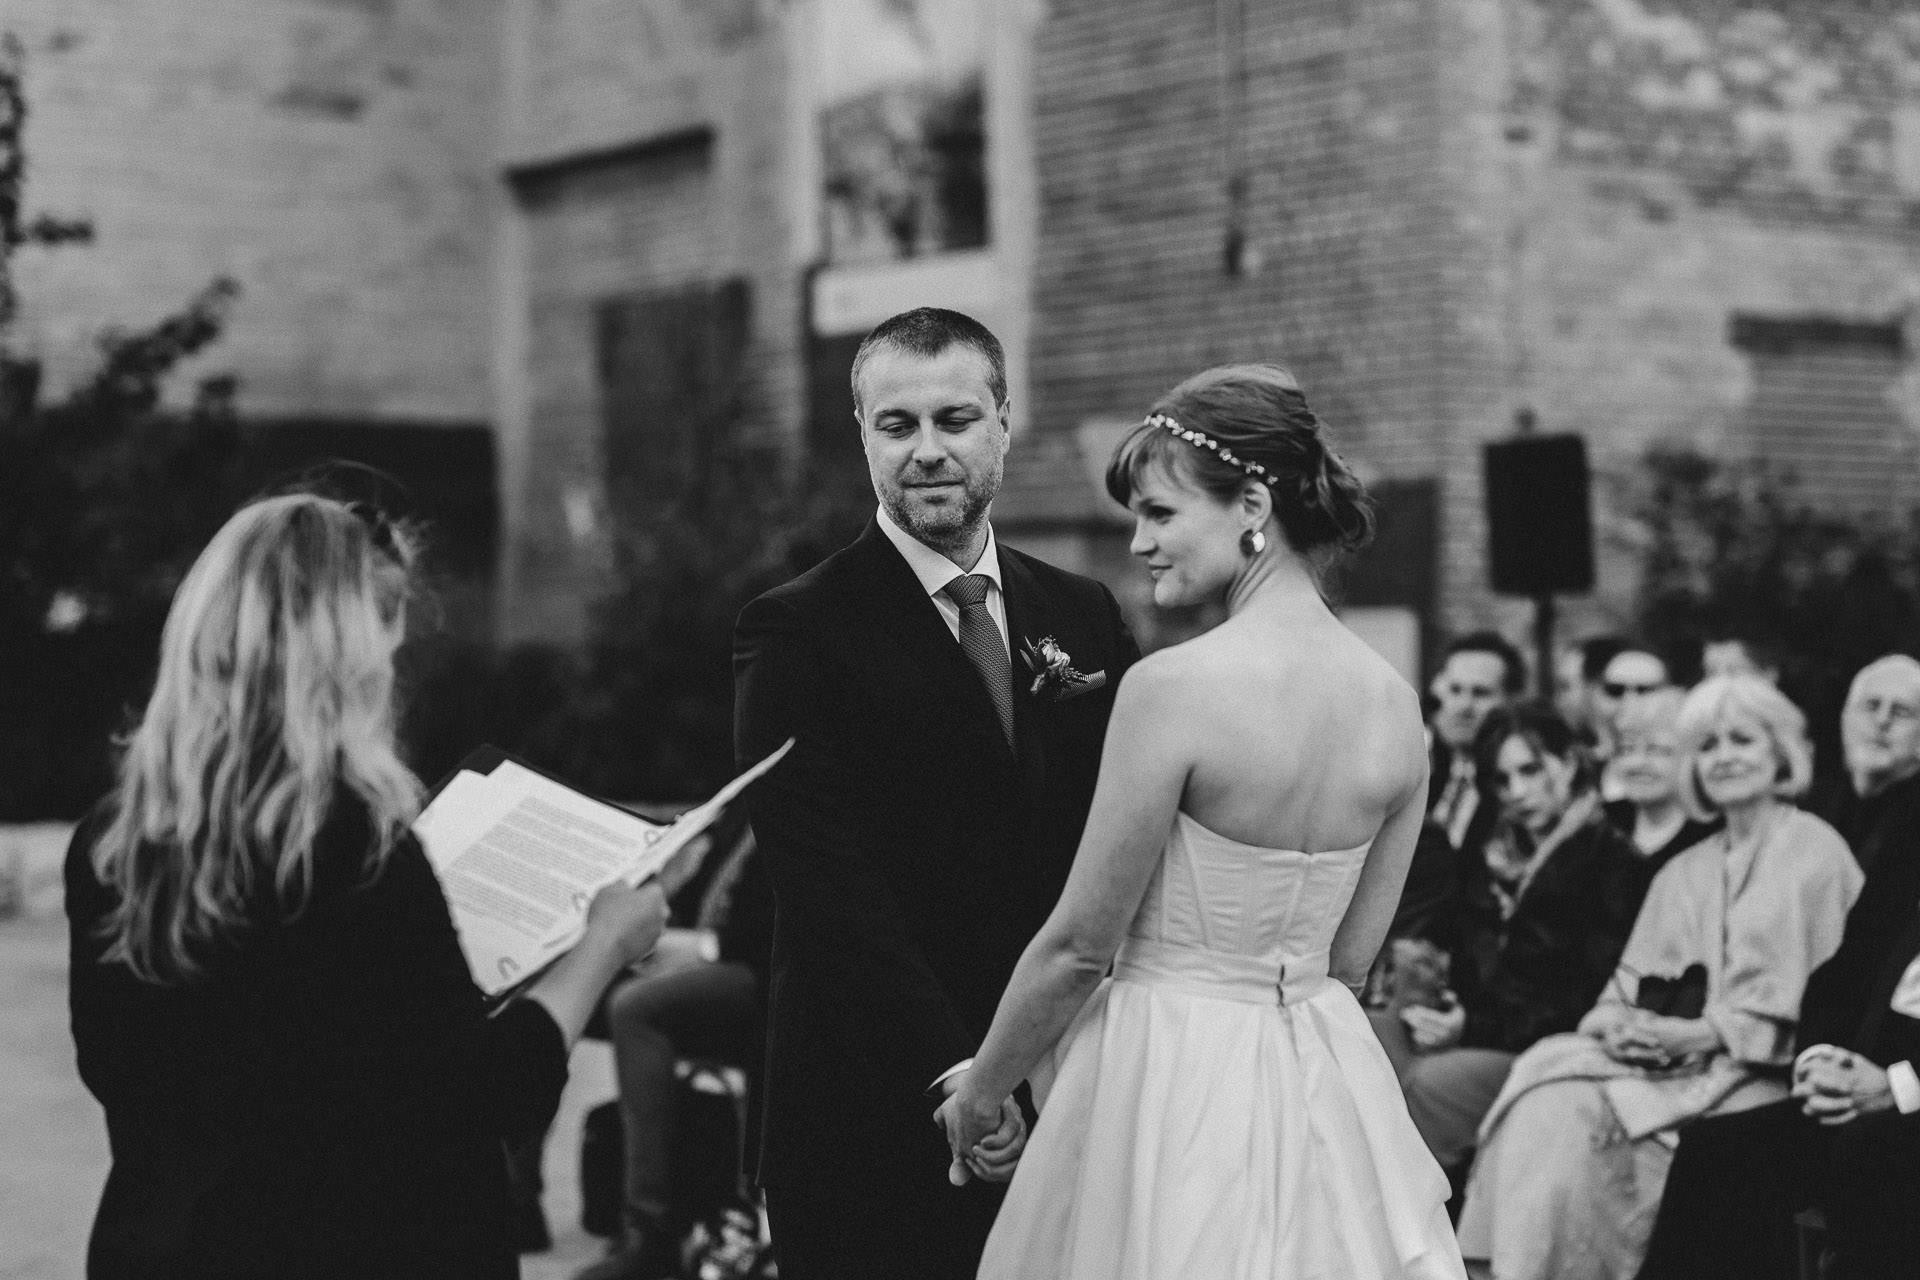 Evergreen Brickworks wedding photographer - urban outdoor ceremony